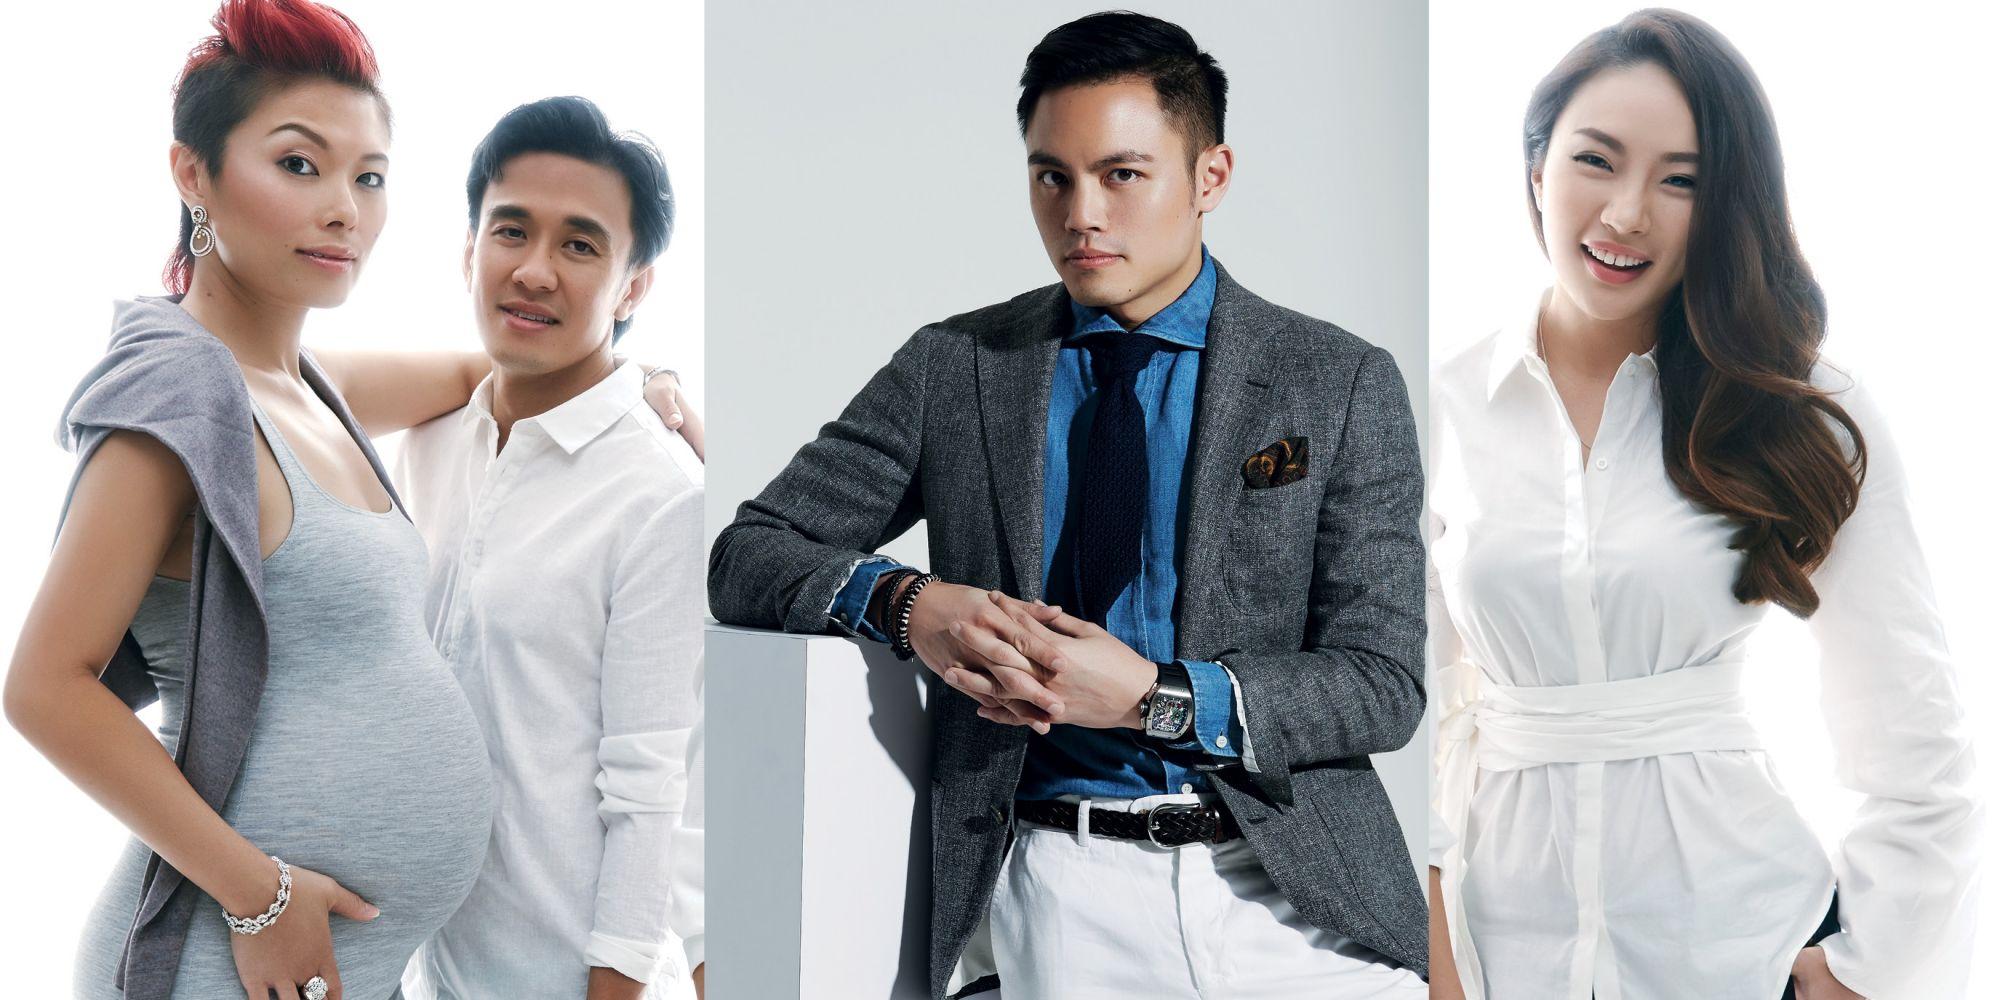 Video: Singapore Generation T Honourees On Their Proudest Accomplishments